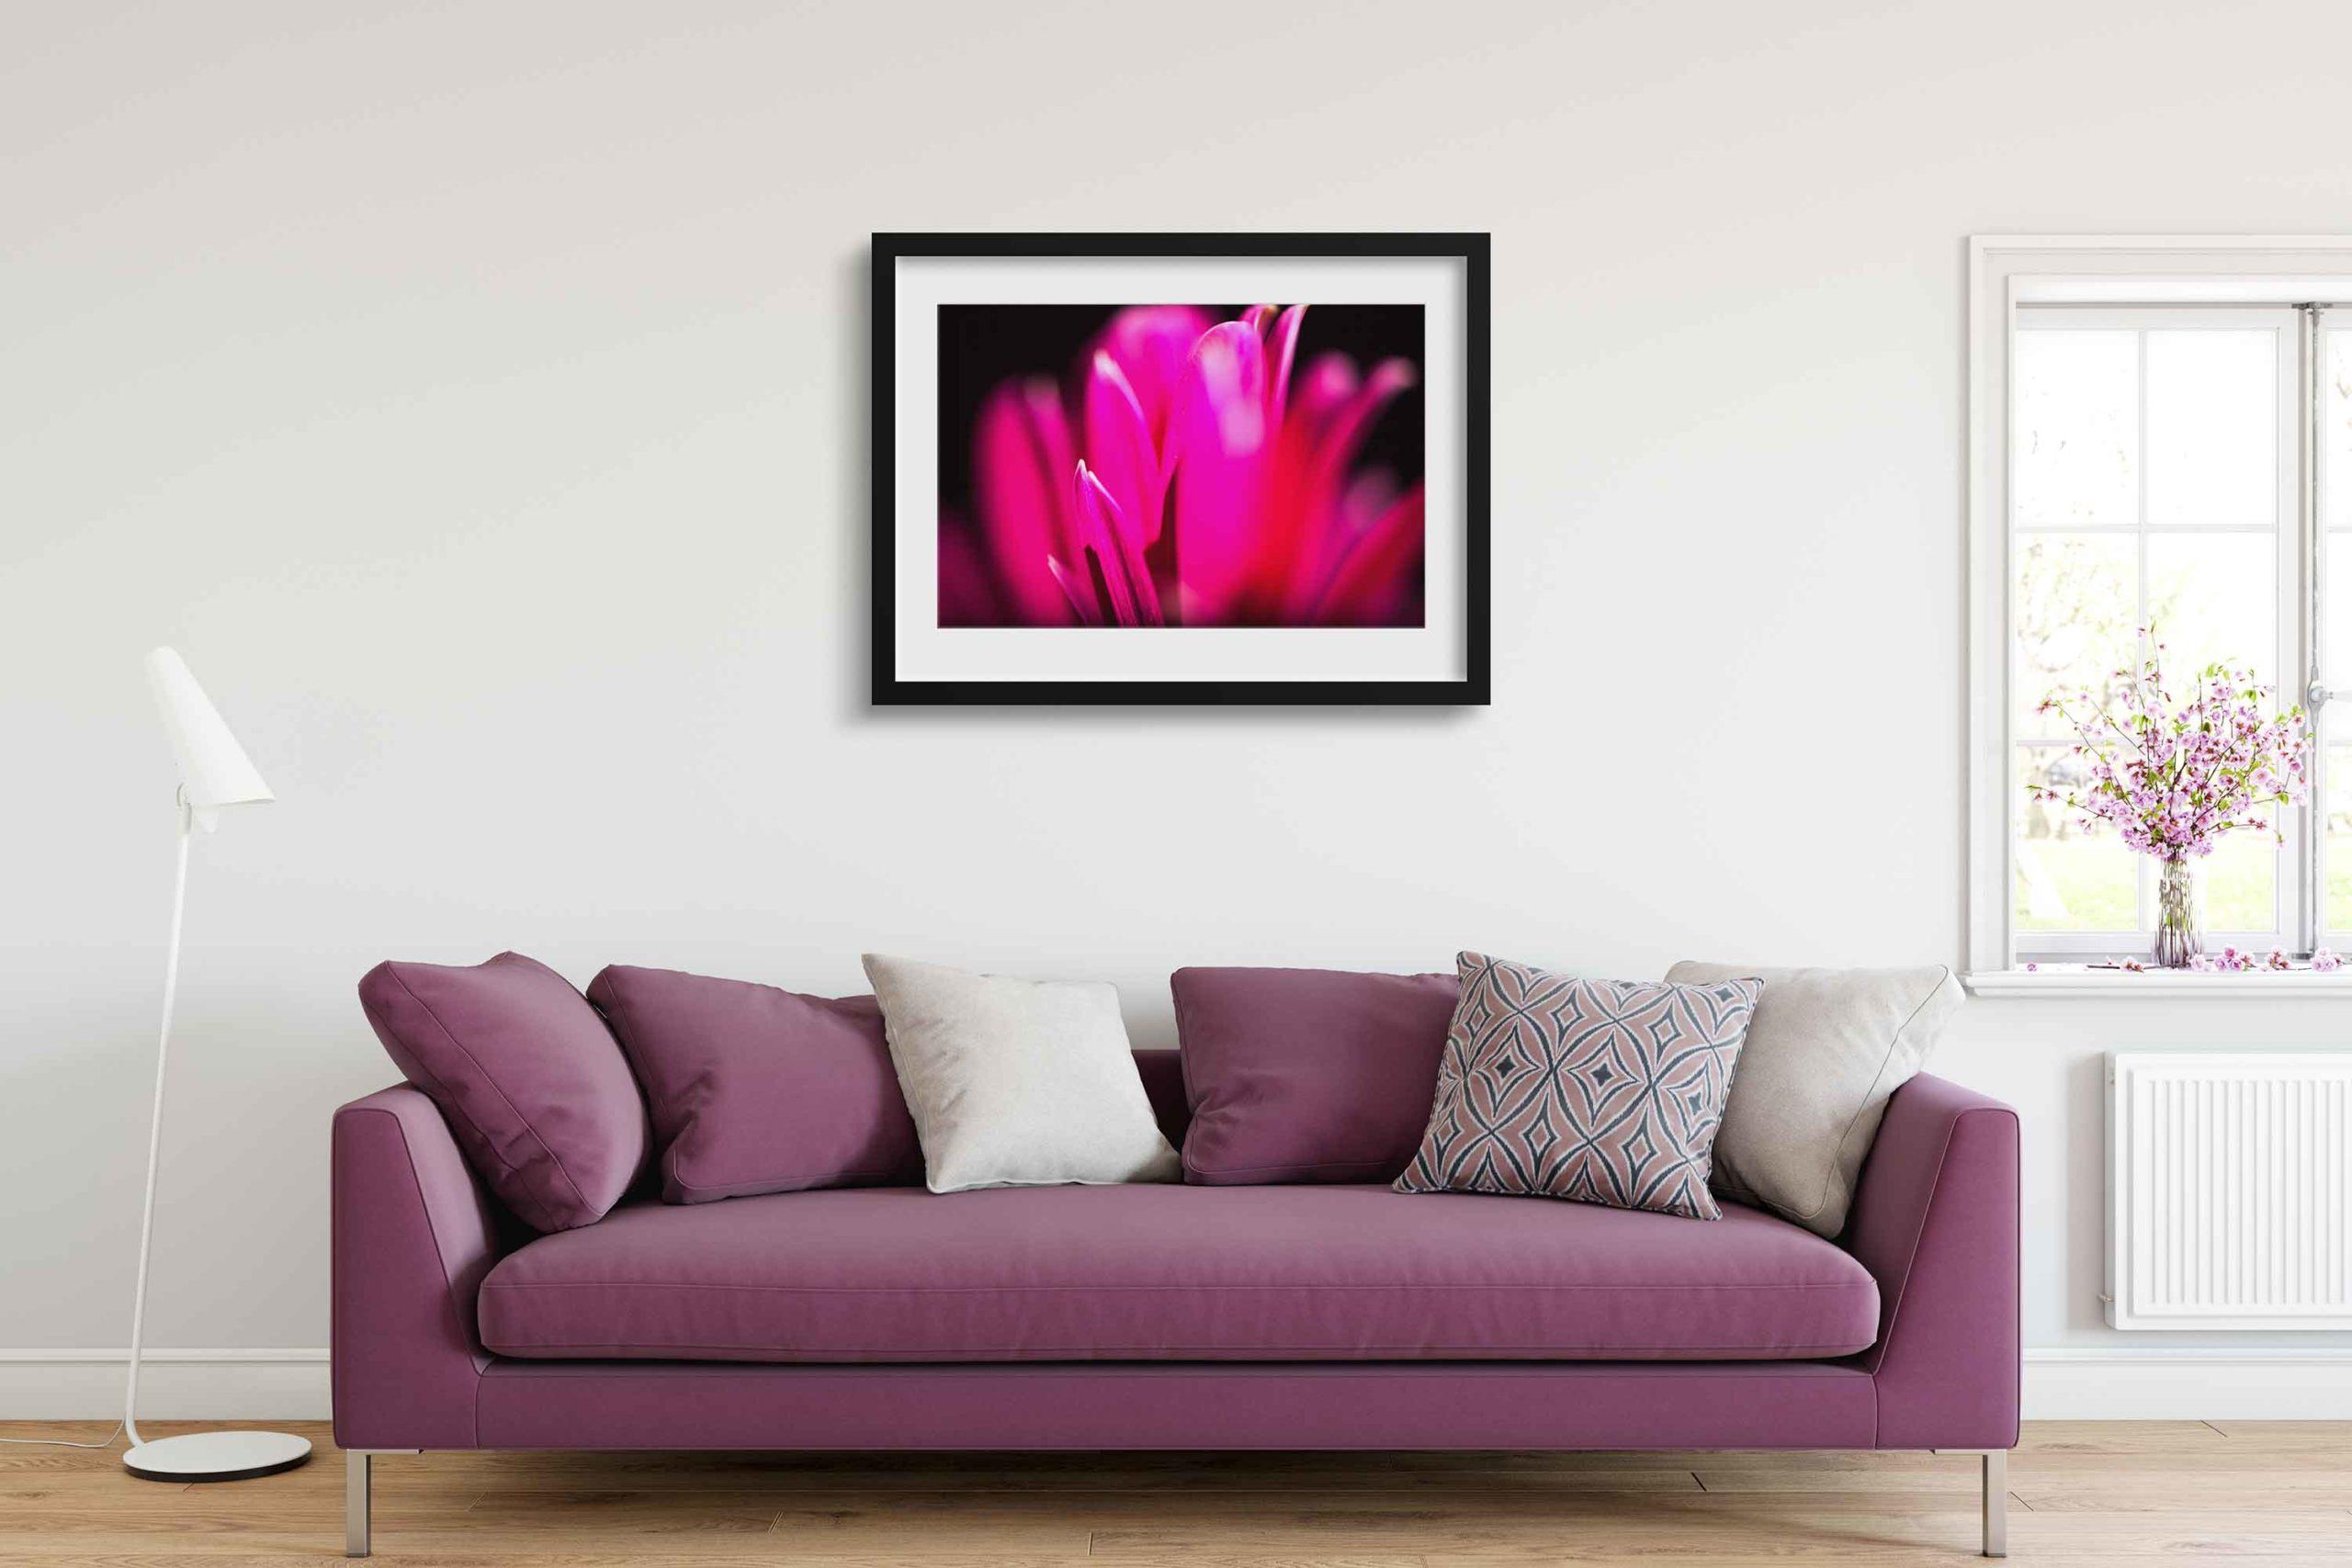 Flower, Plant, Bloom, Blossom, Fresh, Love, Romantic, Macro, Closeup, Detail, Cream, Pink